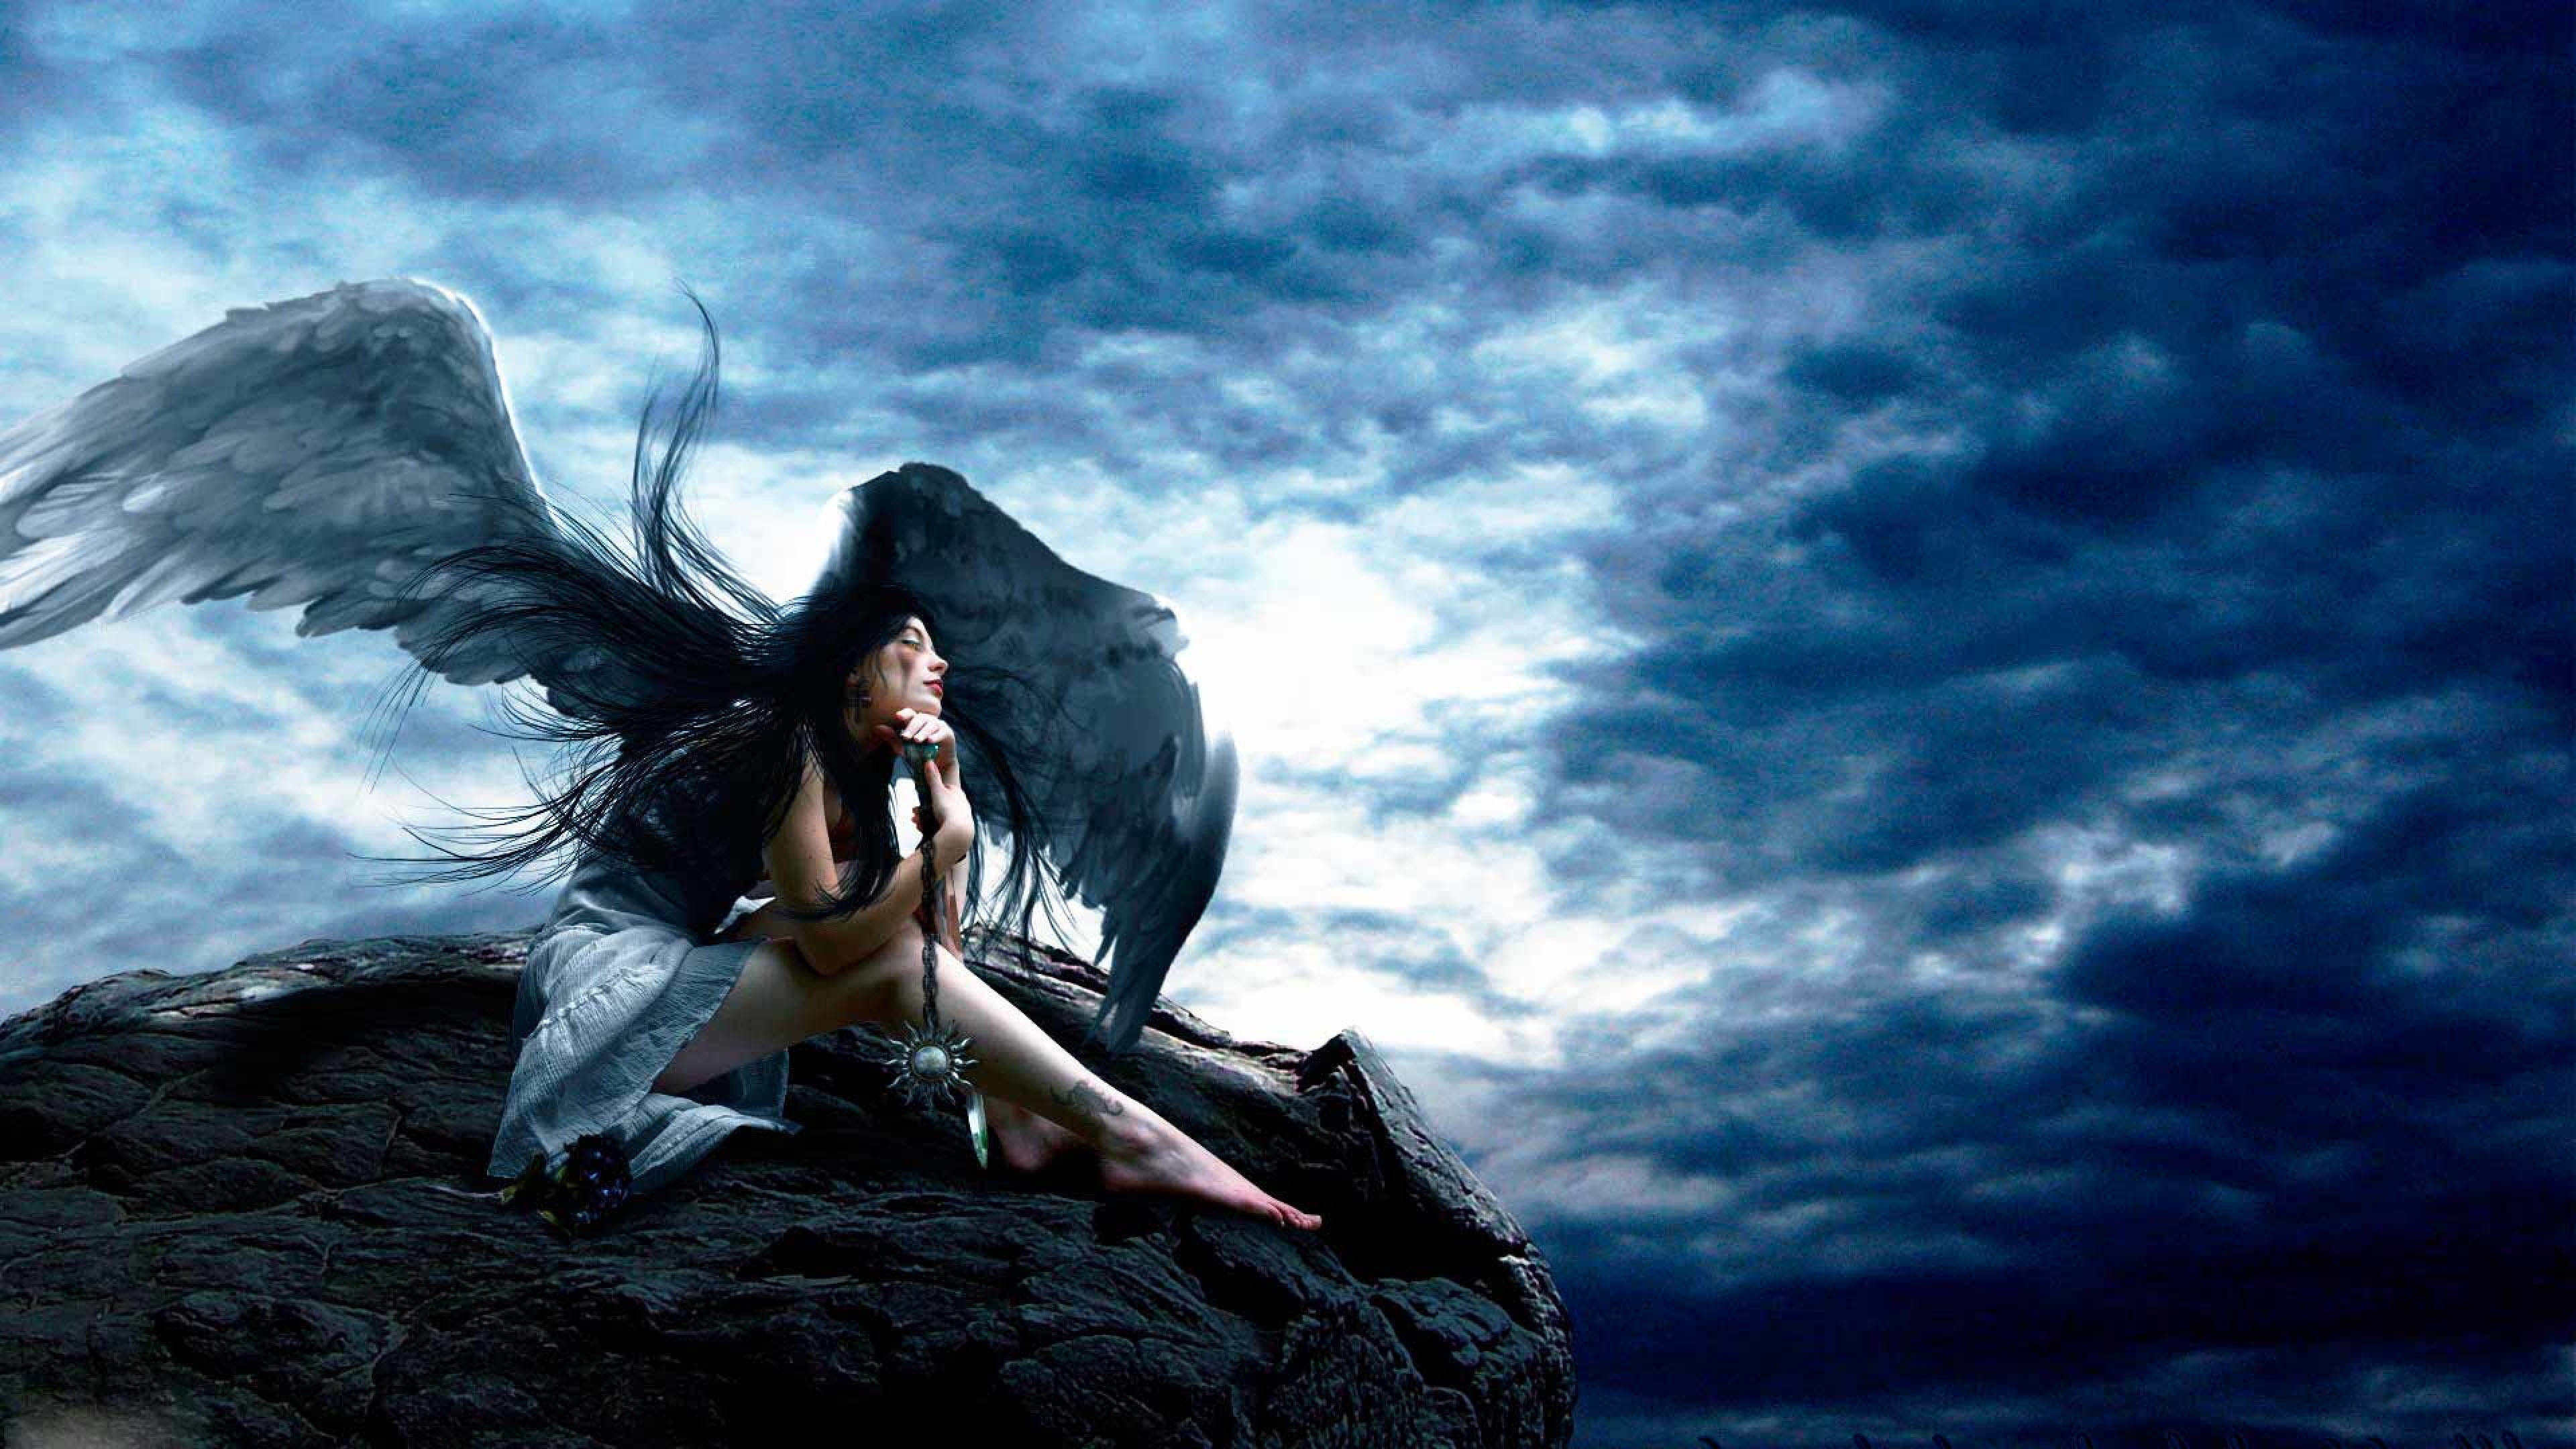 Fantasy Angel Artwork wallpaper